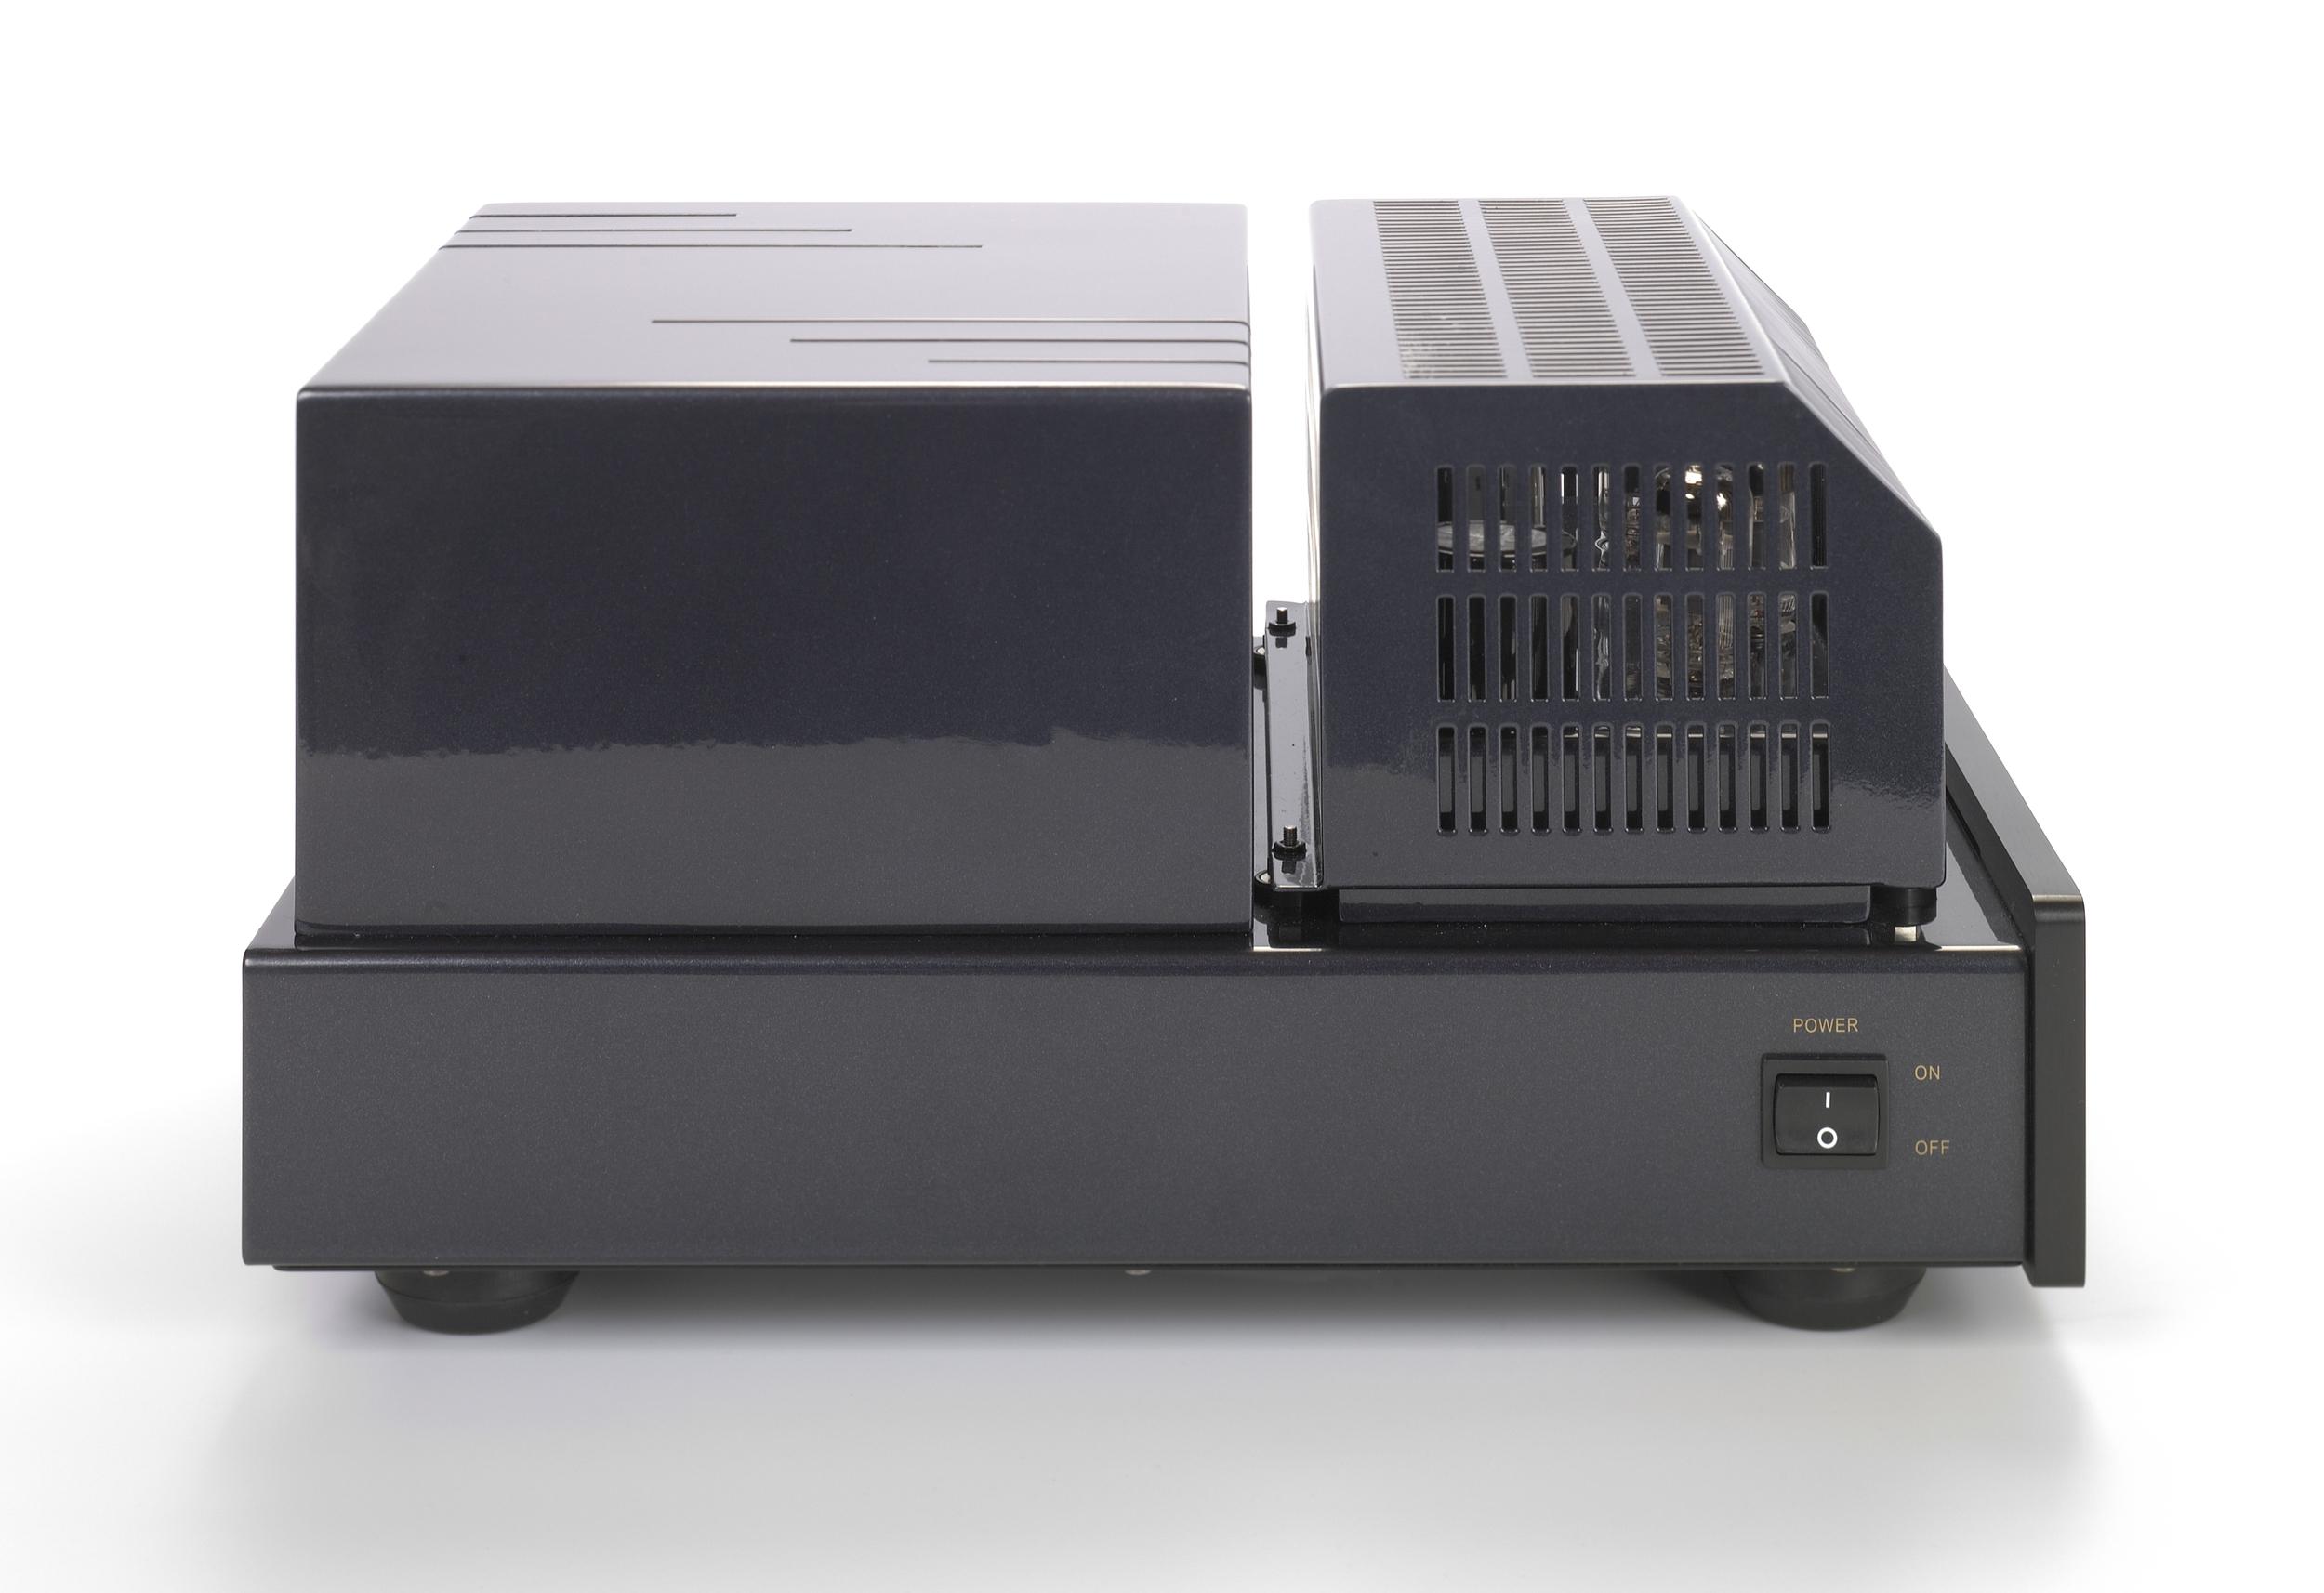 002-PrimaLuna Classic CD Player-zwart.jpg